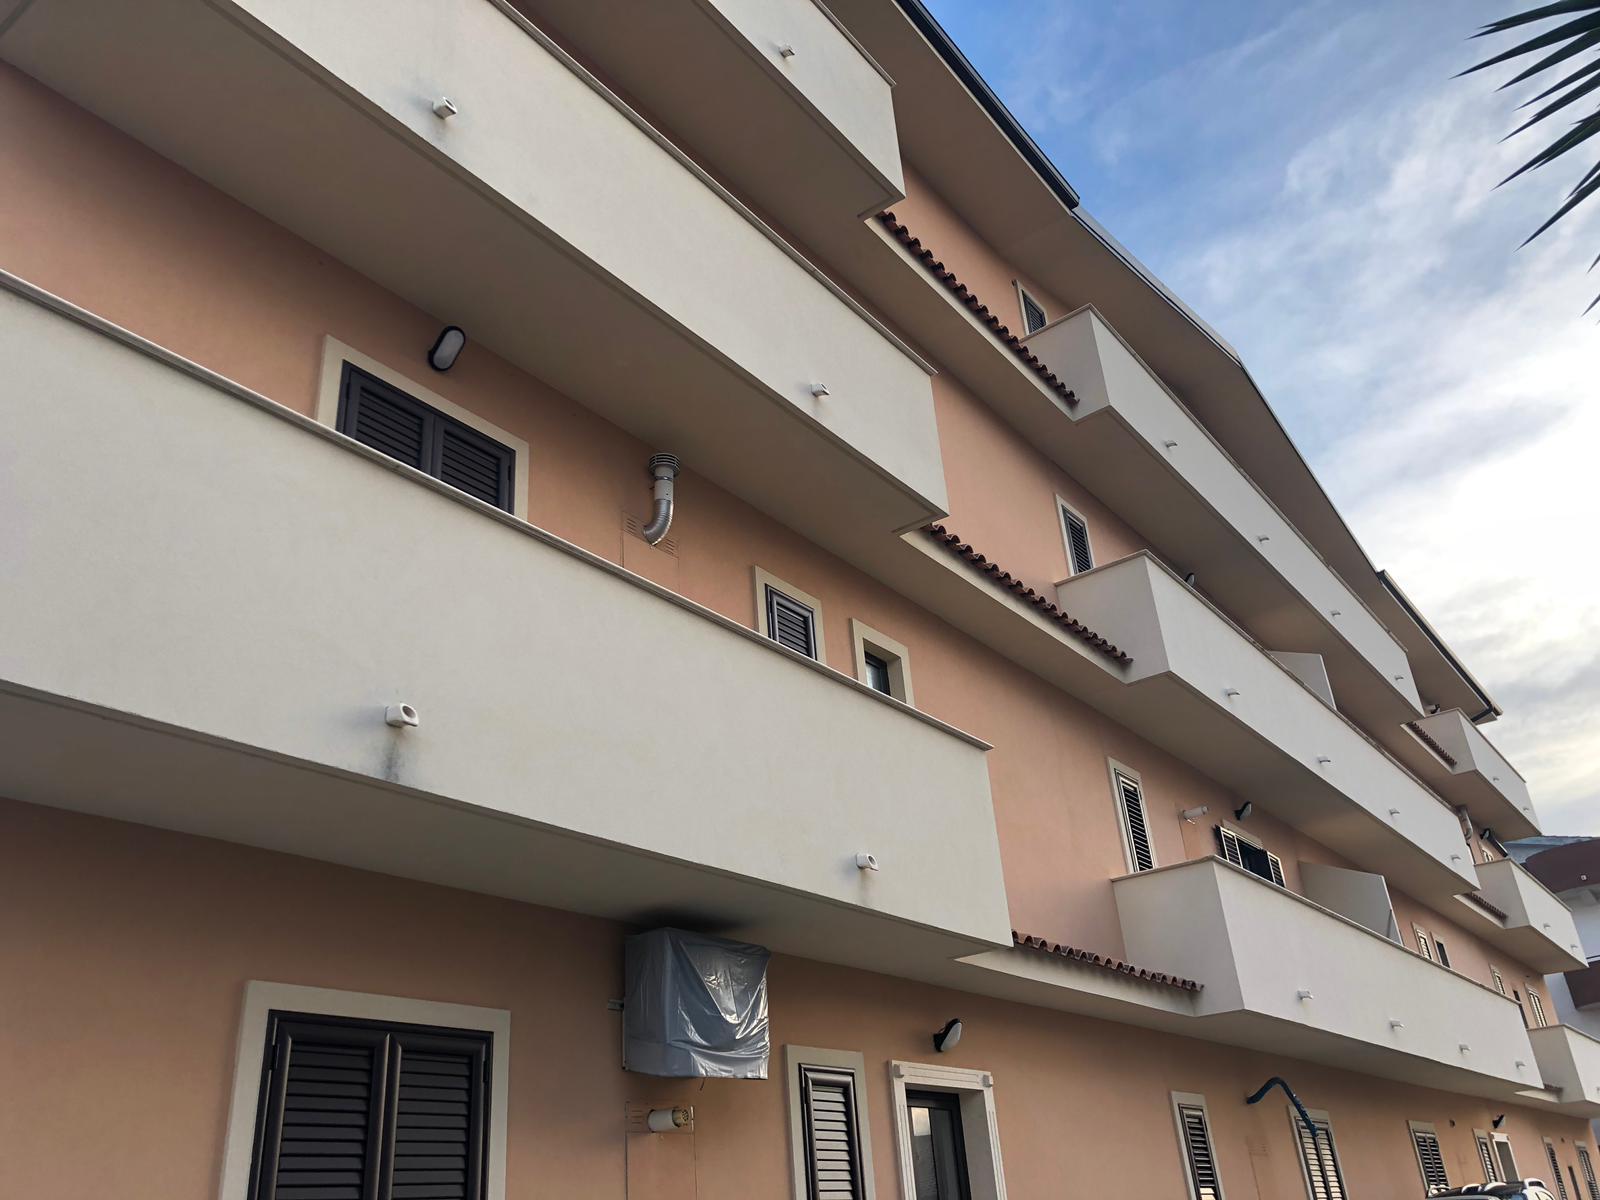 Appartamenti di Nuova Costruzione in Caulonia